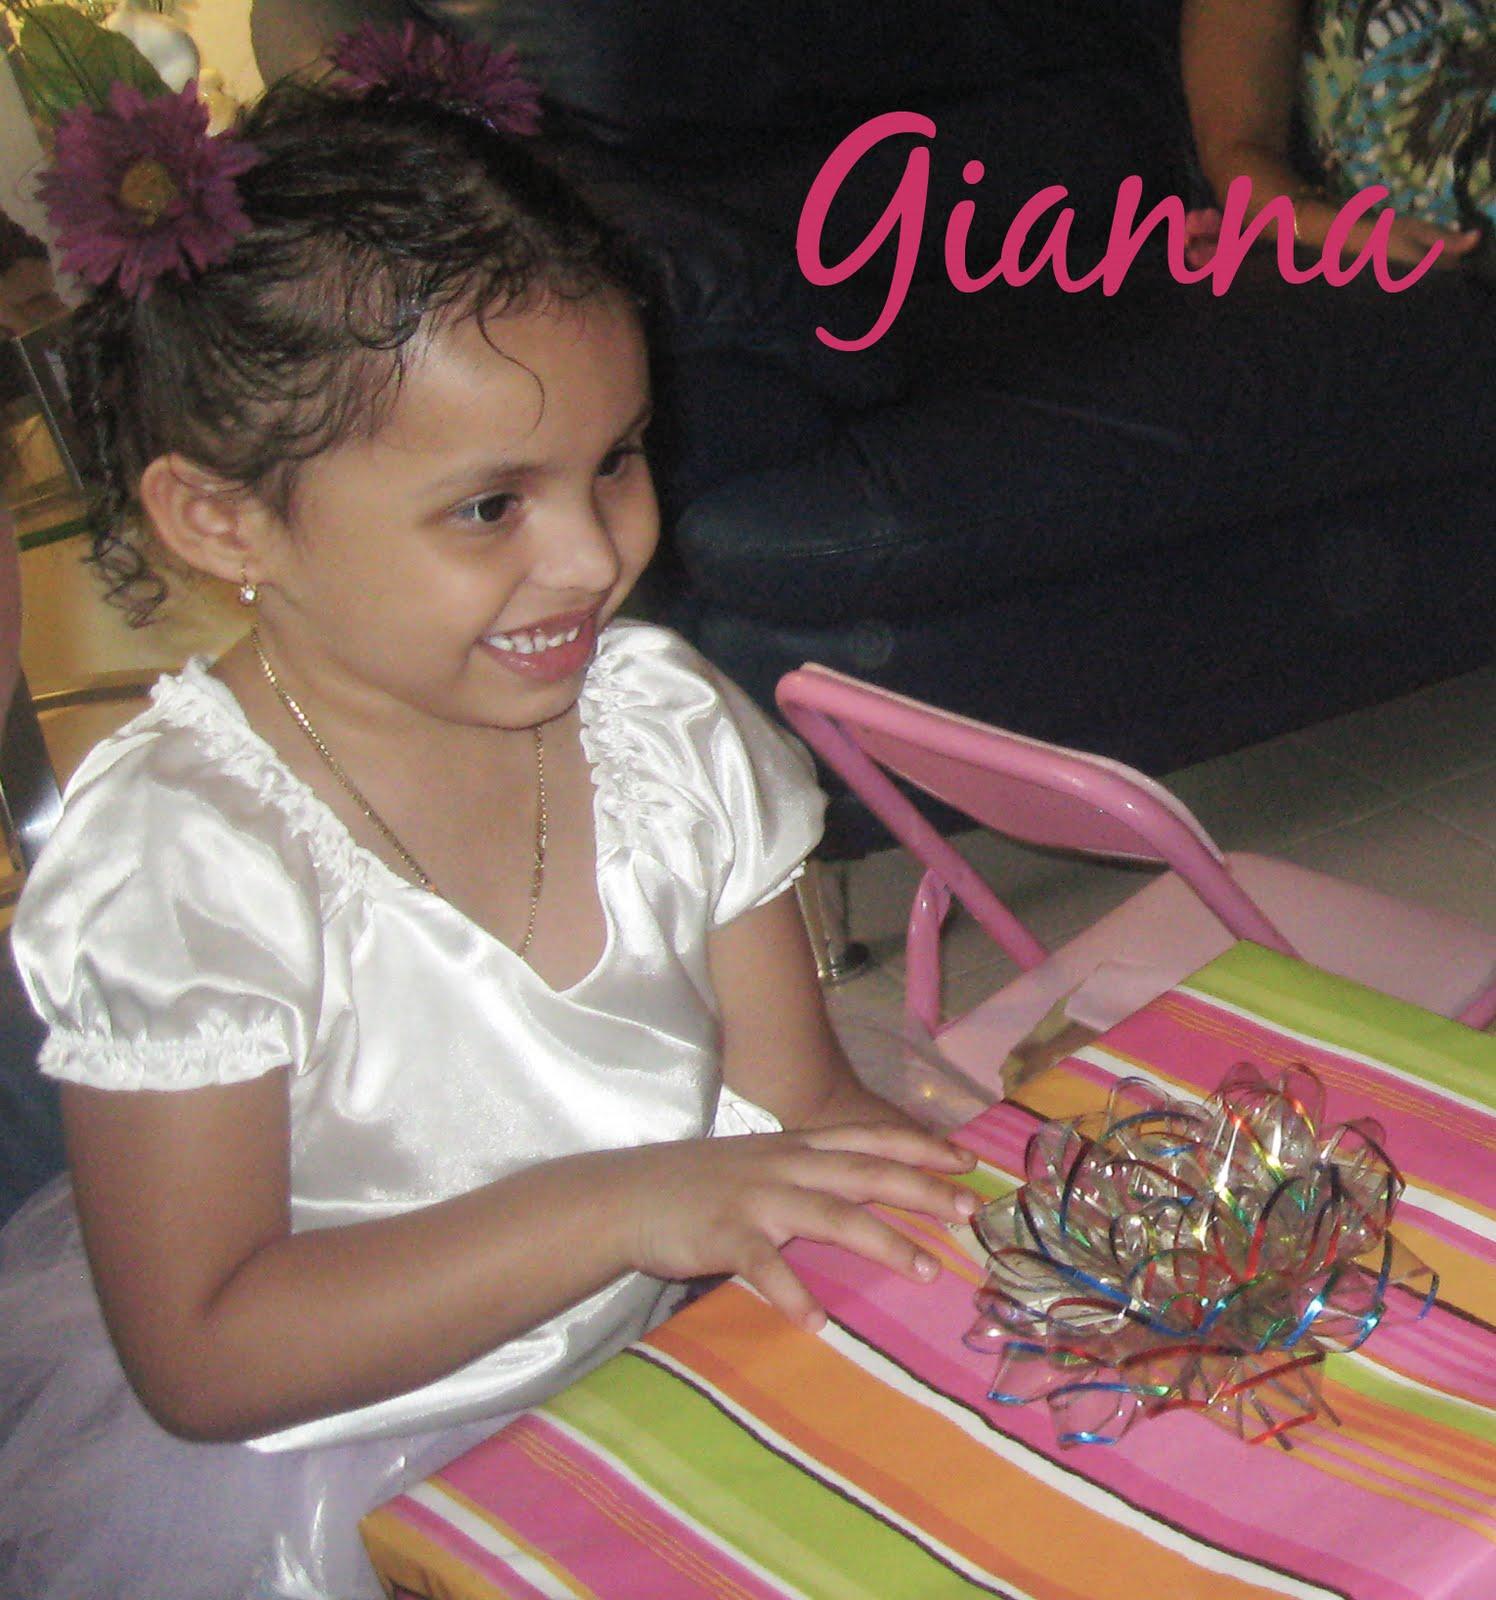 http://2.bp.blogspot.com/_vJf-5fc8cSo/TGBwyHCT1ZI/AAAAAAAAALo/1WBjnY6gD8A/s1600/littleballerina_gianna2.jpg